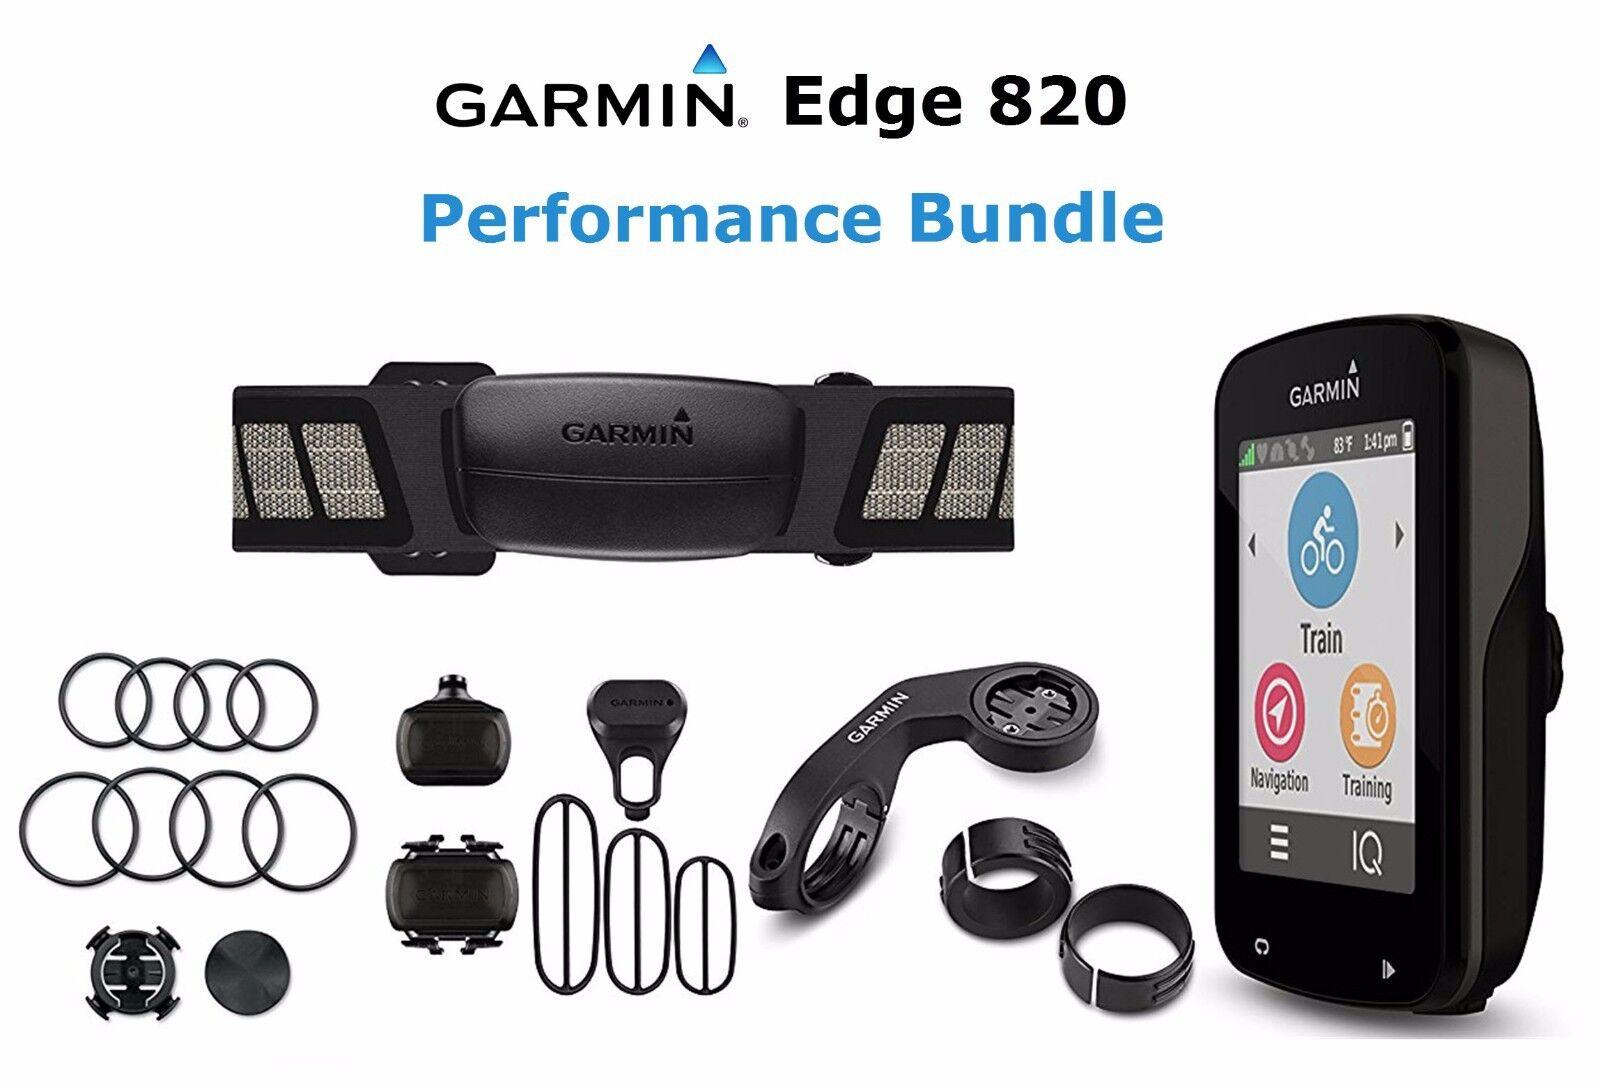 Garmin Edge 820 Performance Bundle GPS Reloj de Computadora Bicicleta de ciclismo nuevo ciclo HRM